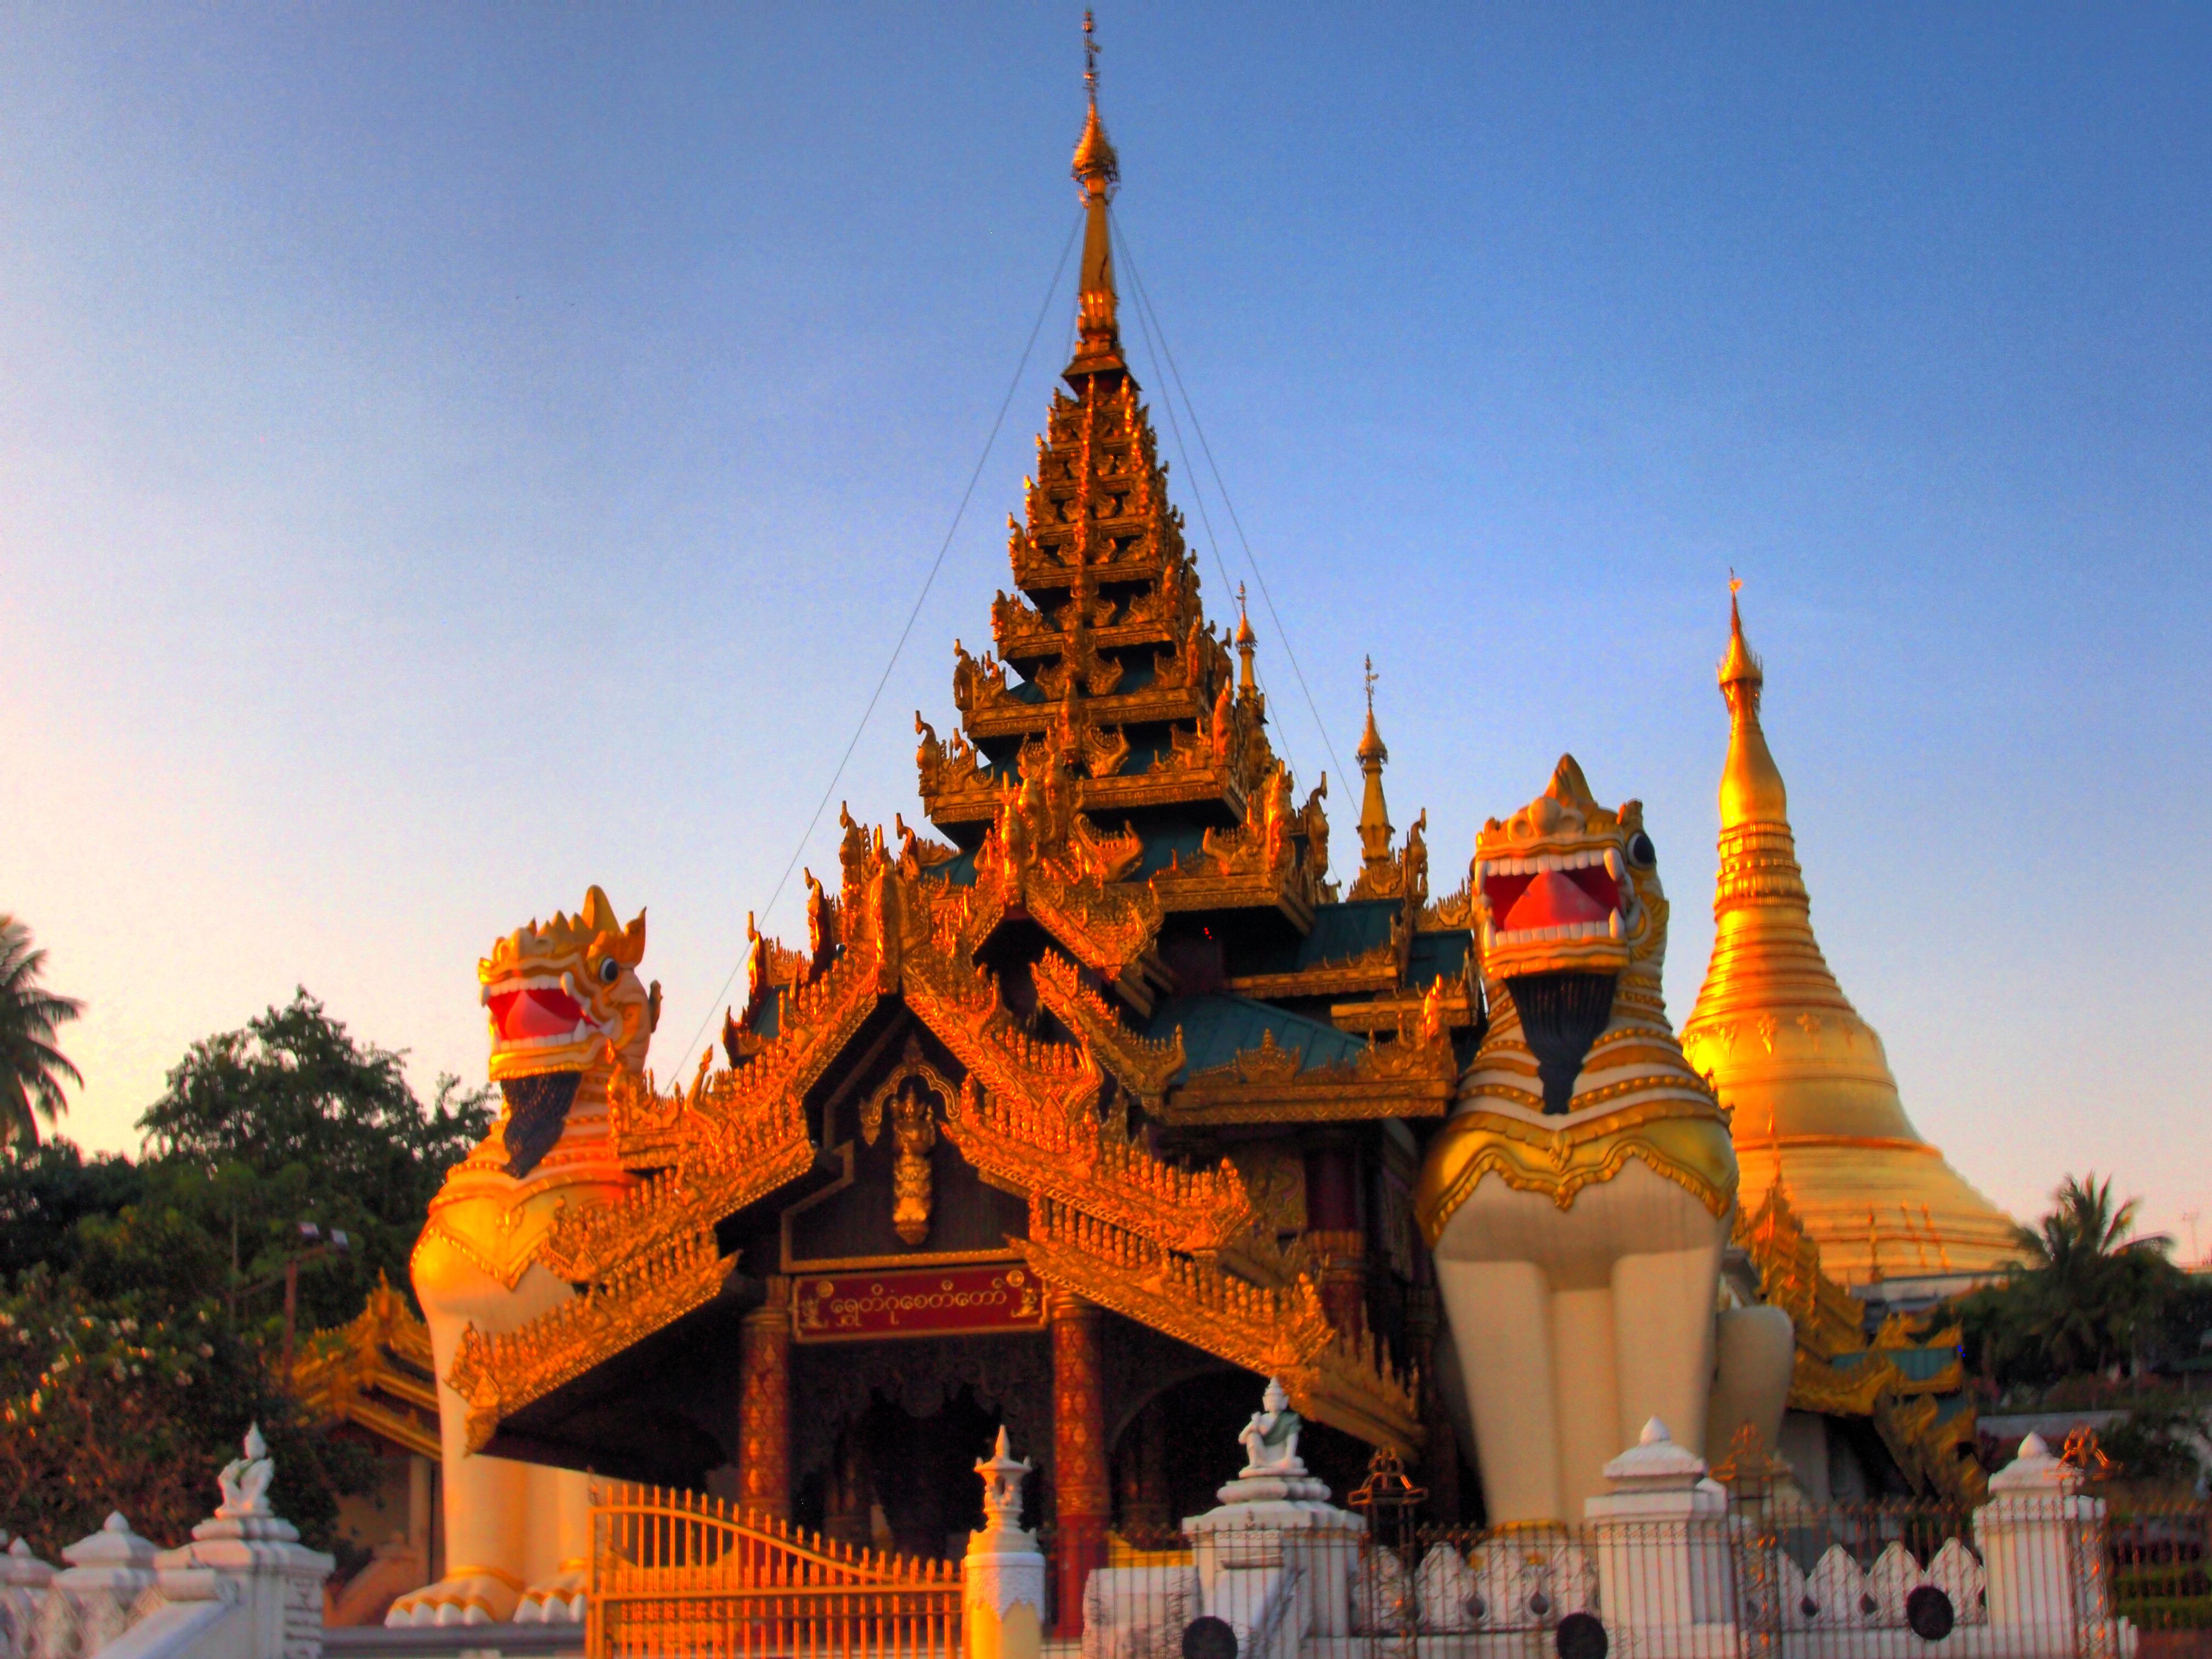 P1231310_1_2 HDR Myammar Yangon Pagoda